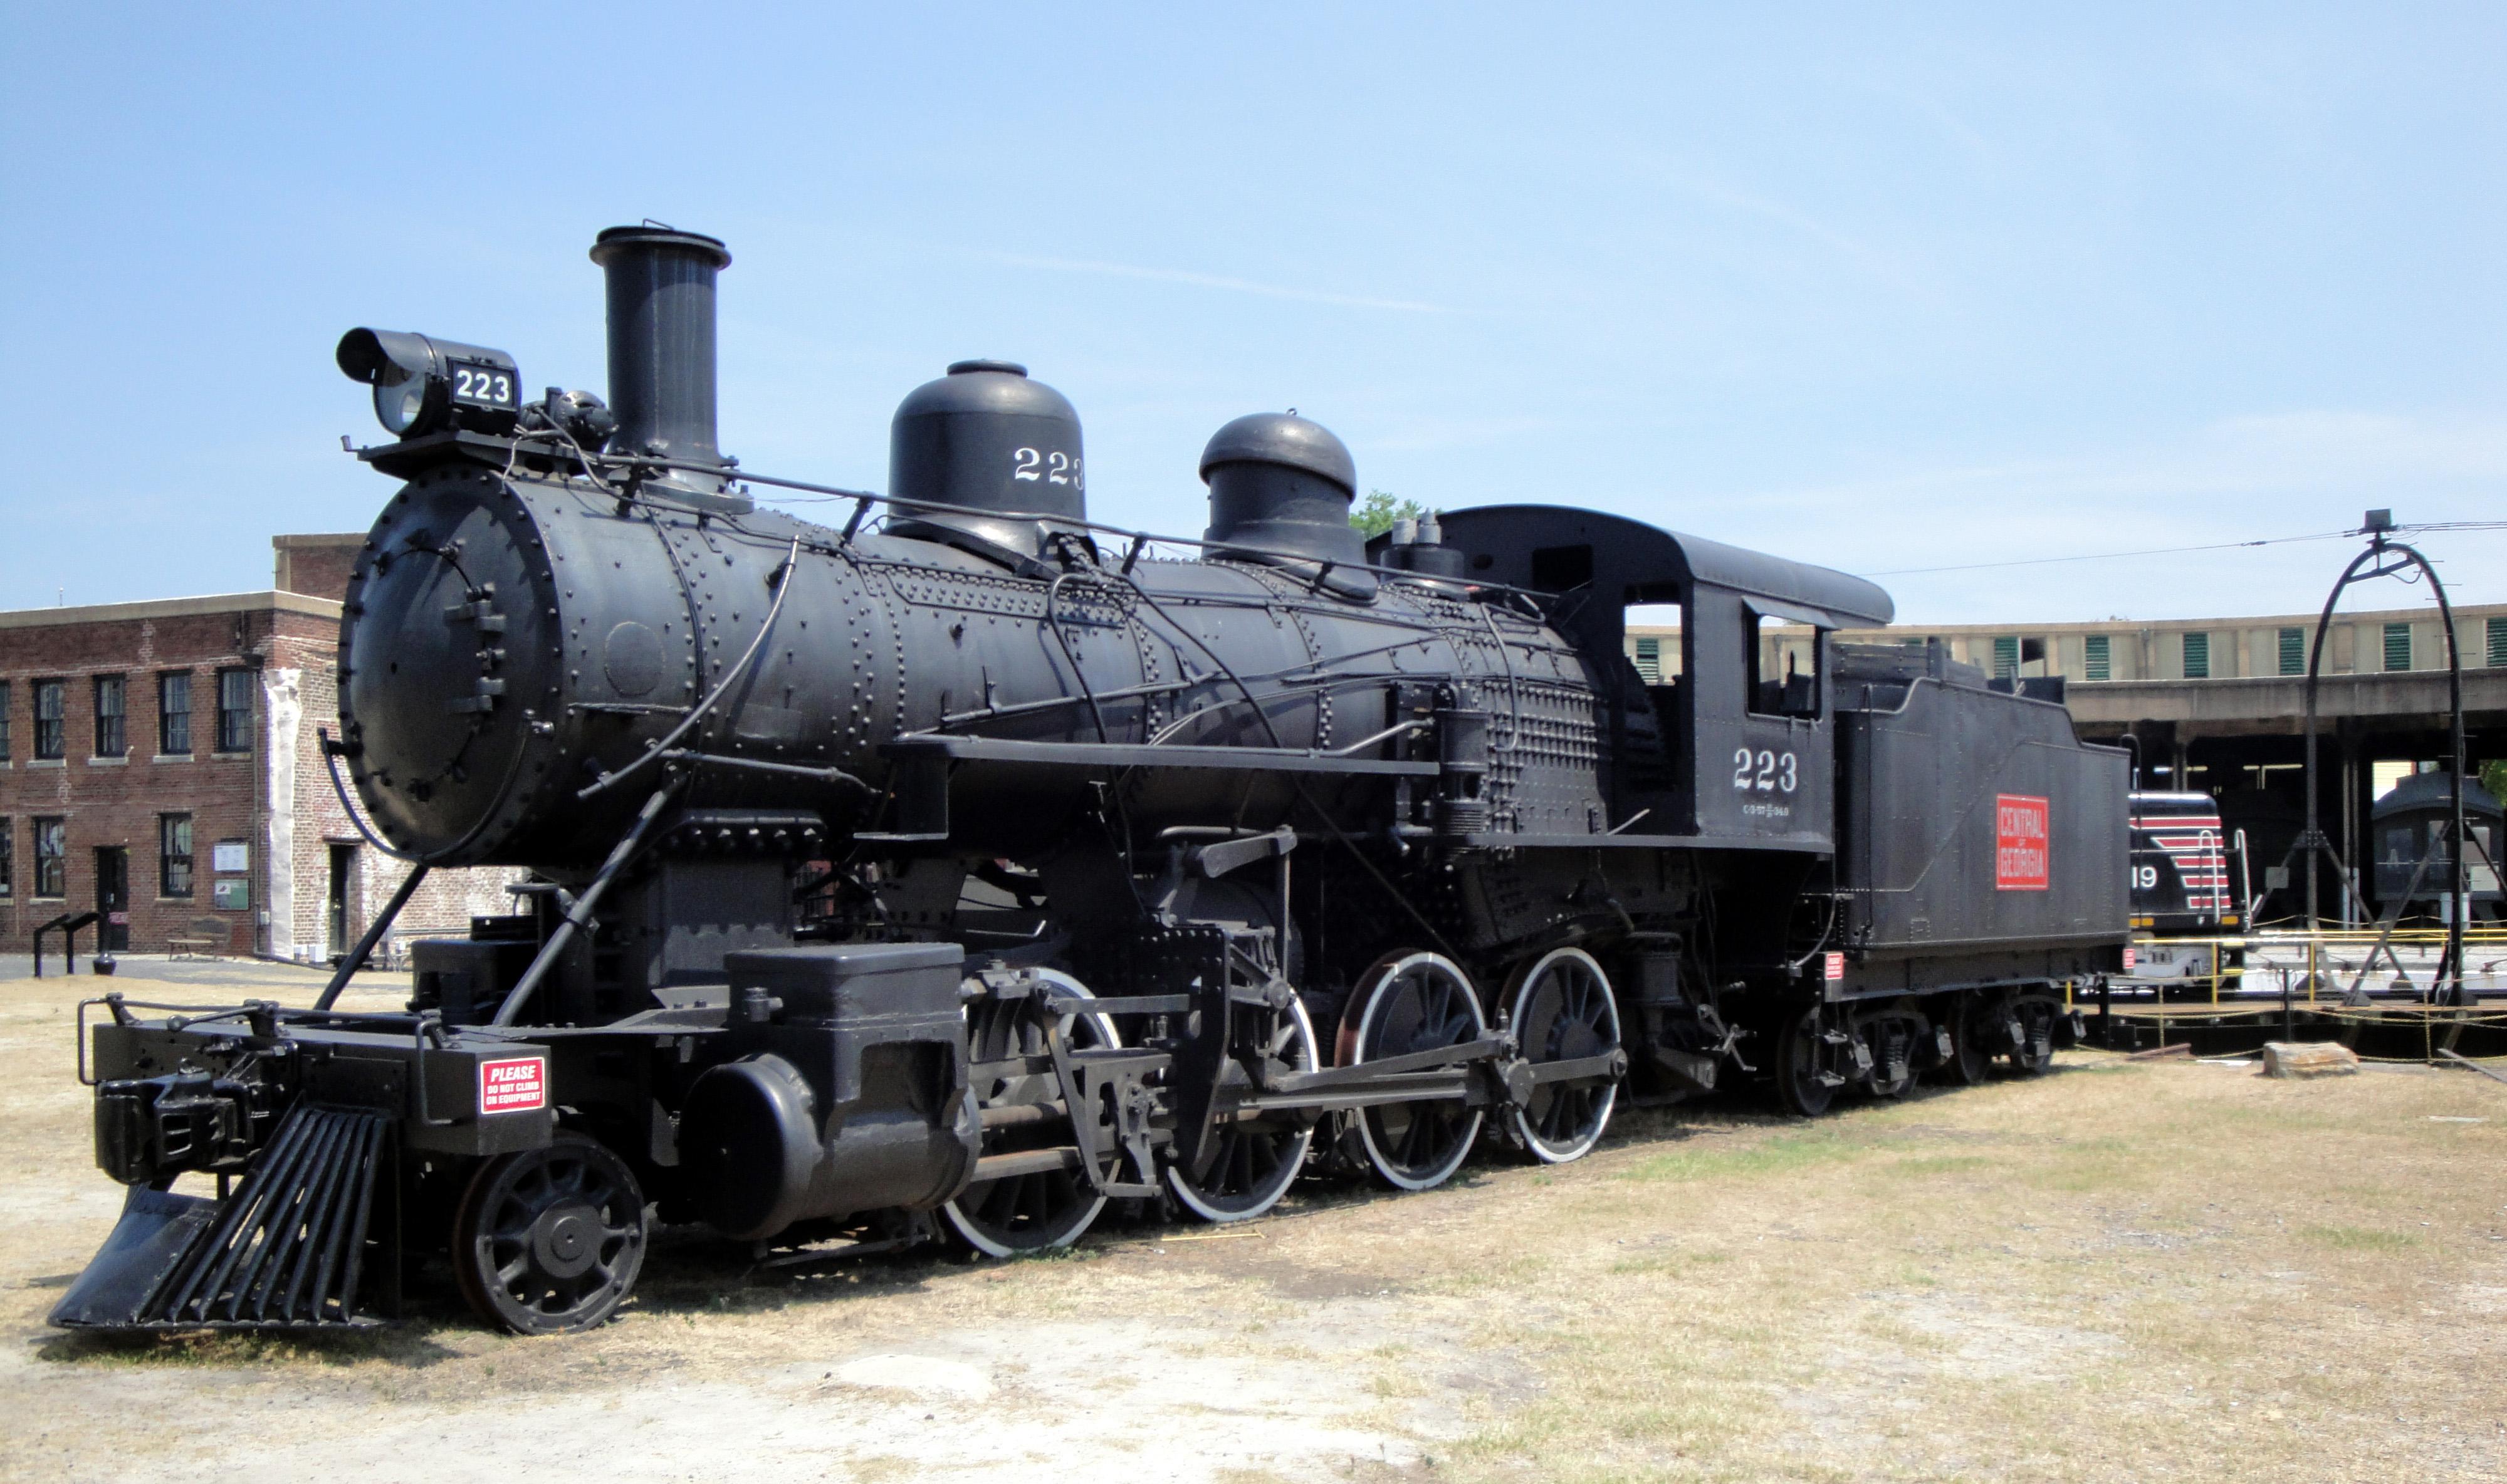 Virginia City Railroad Tour